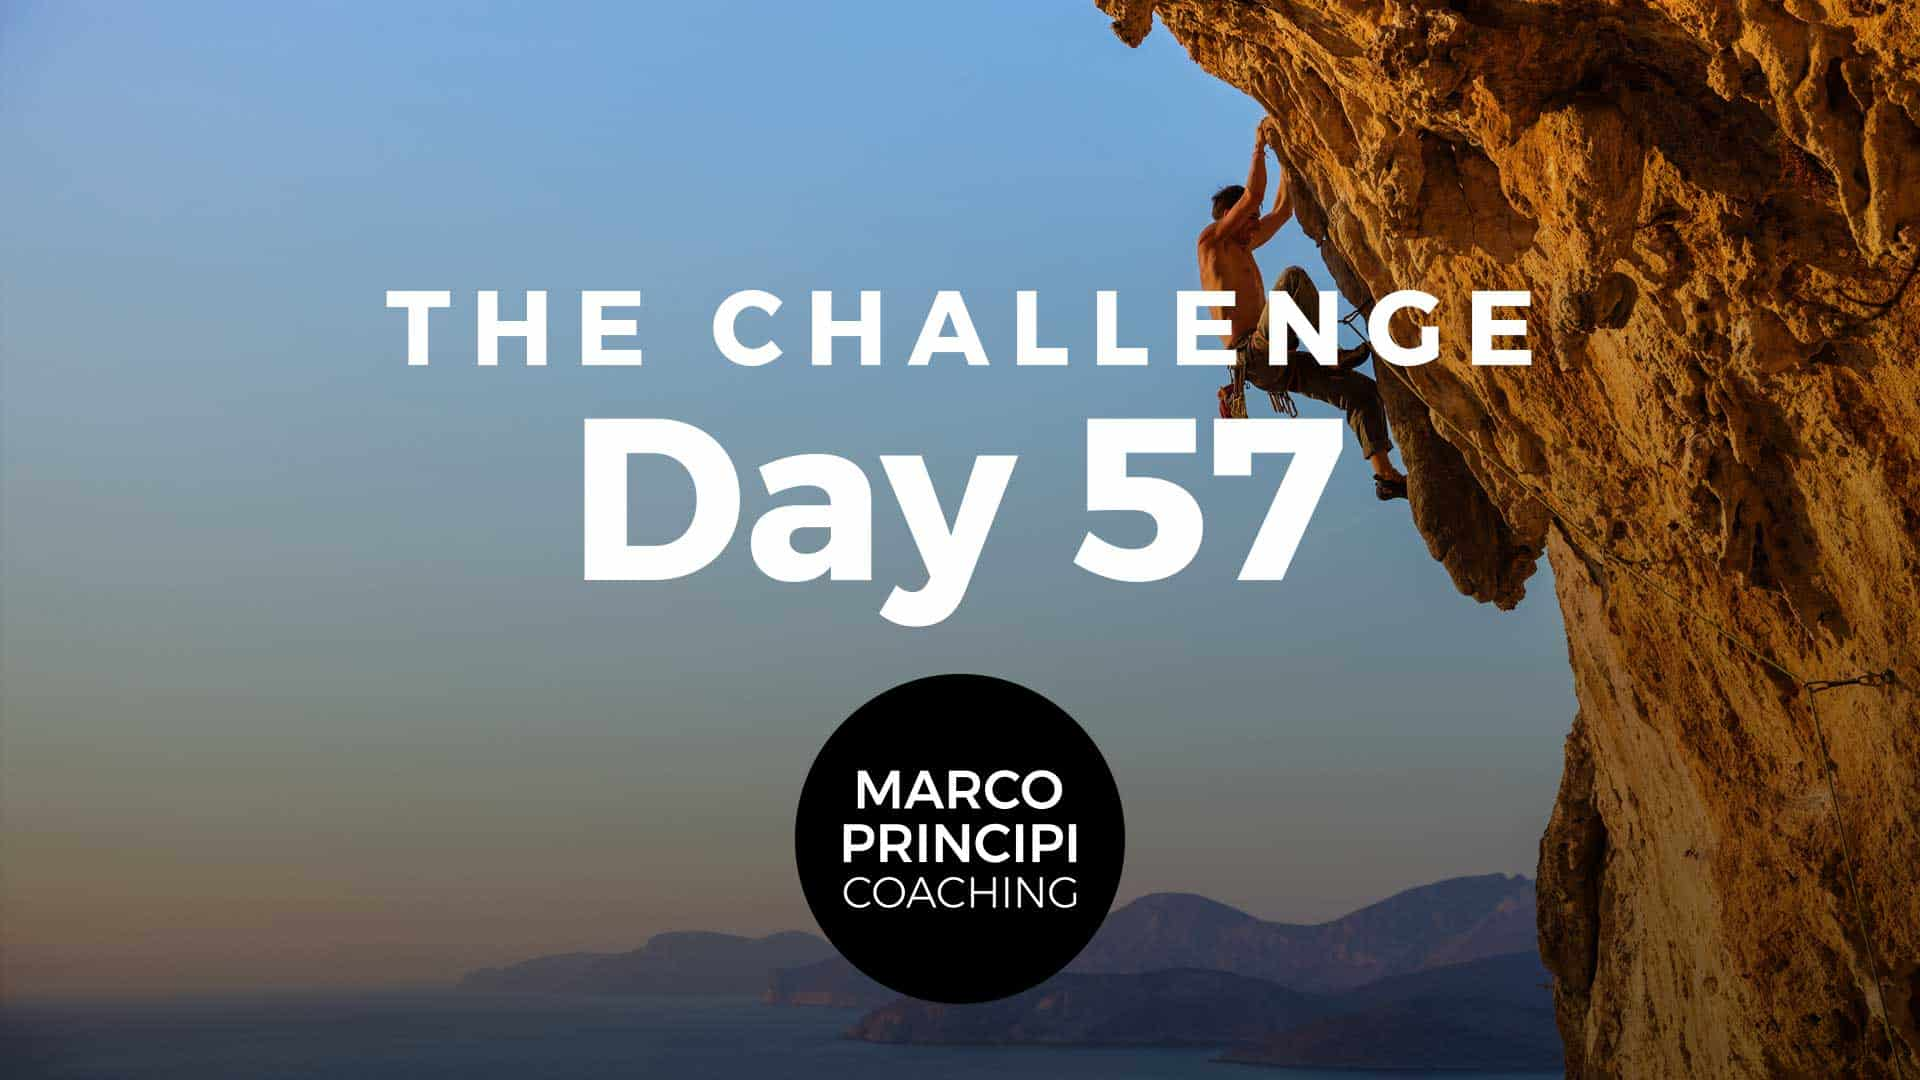 Marco Principi The Challenge Day 57